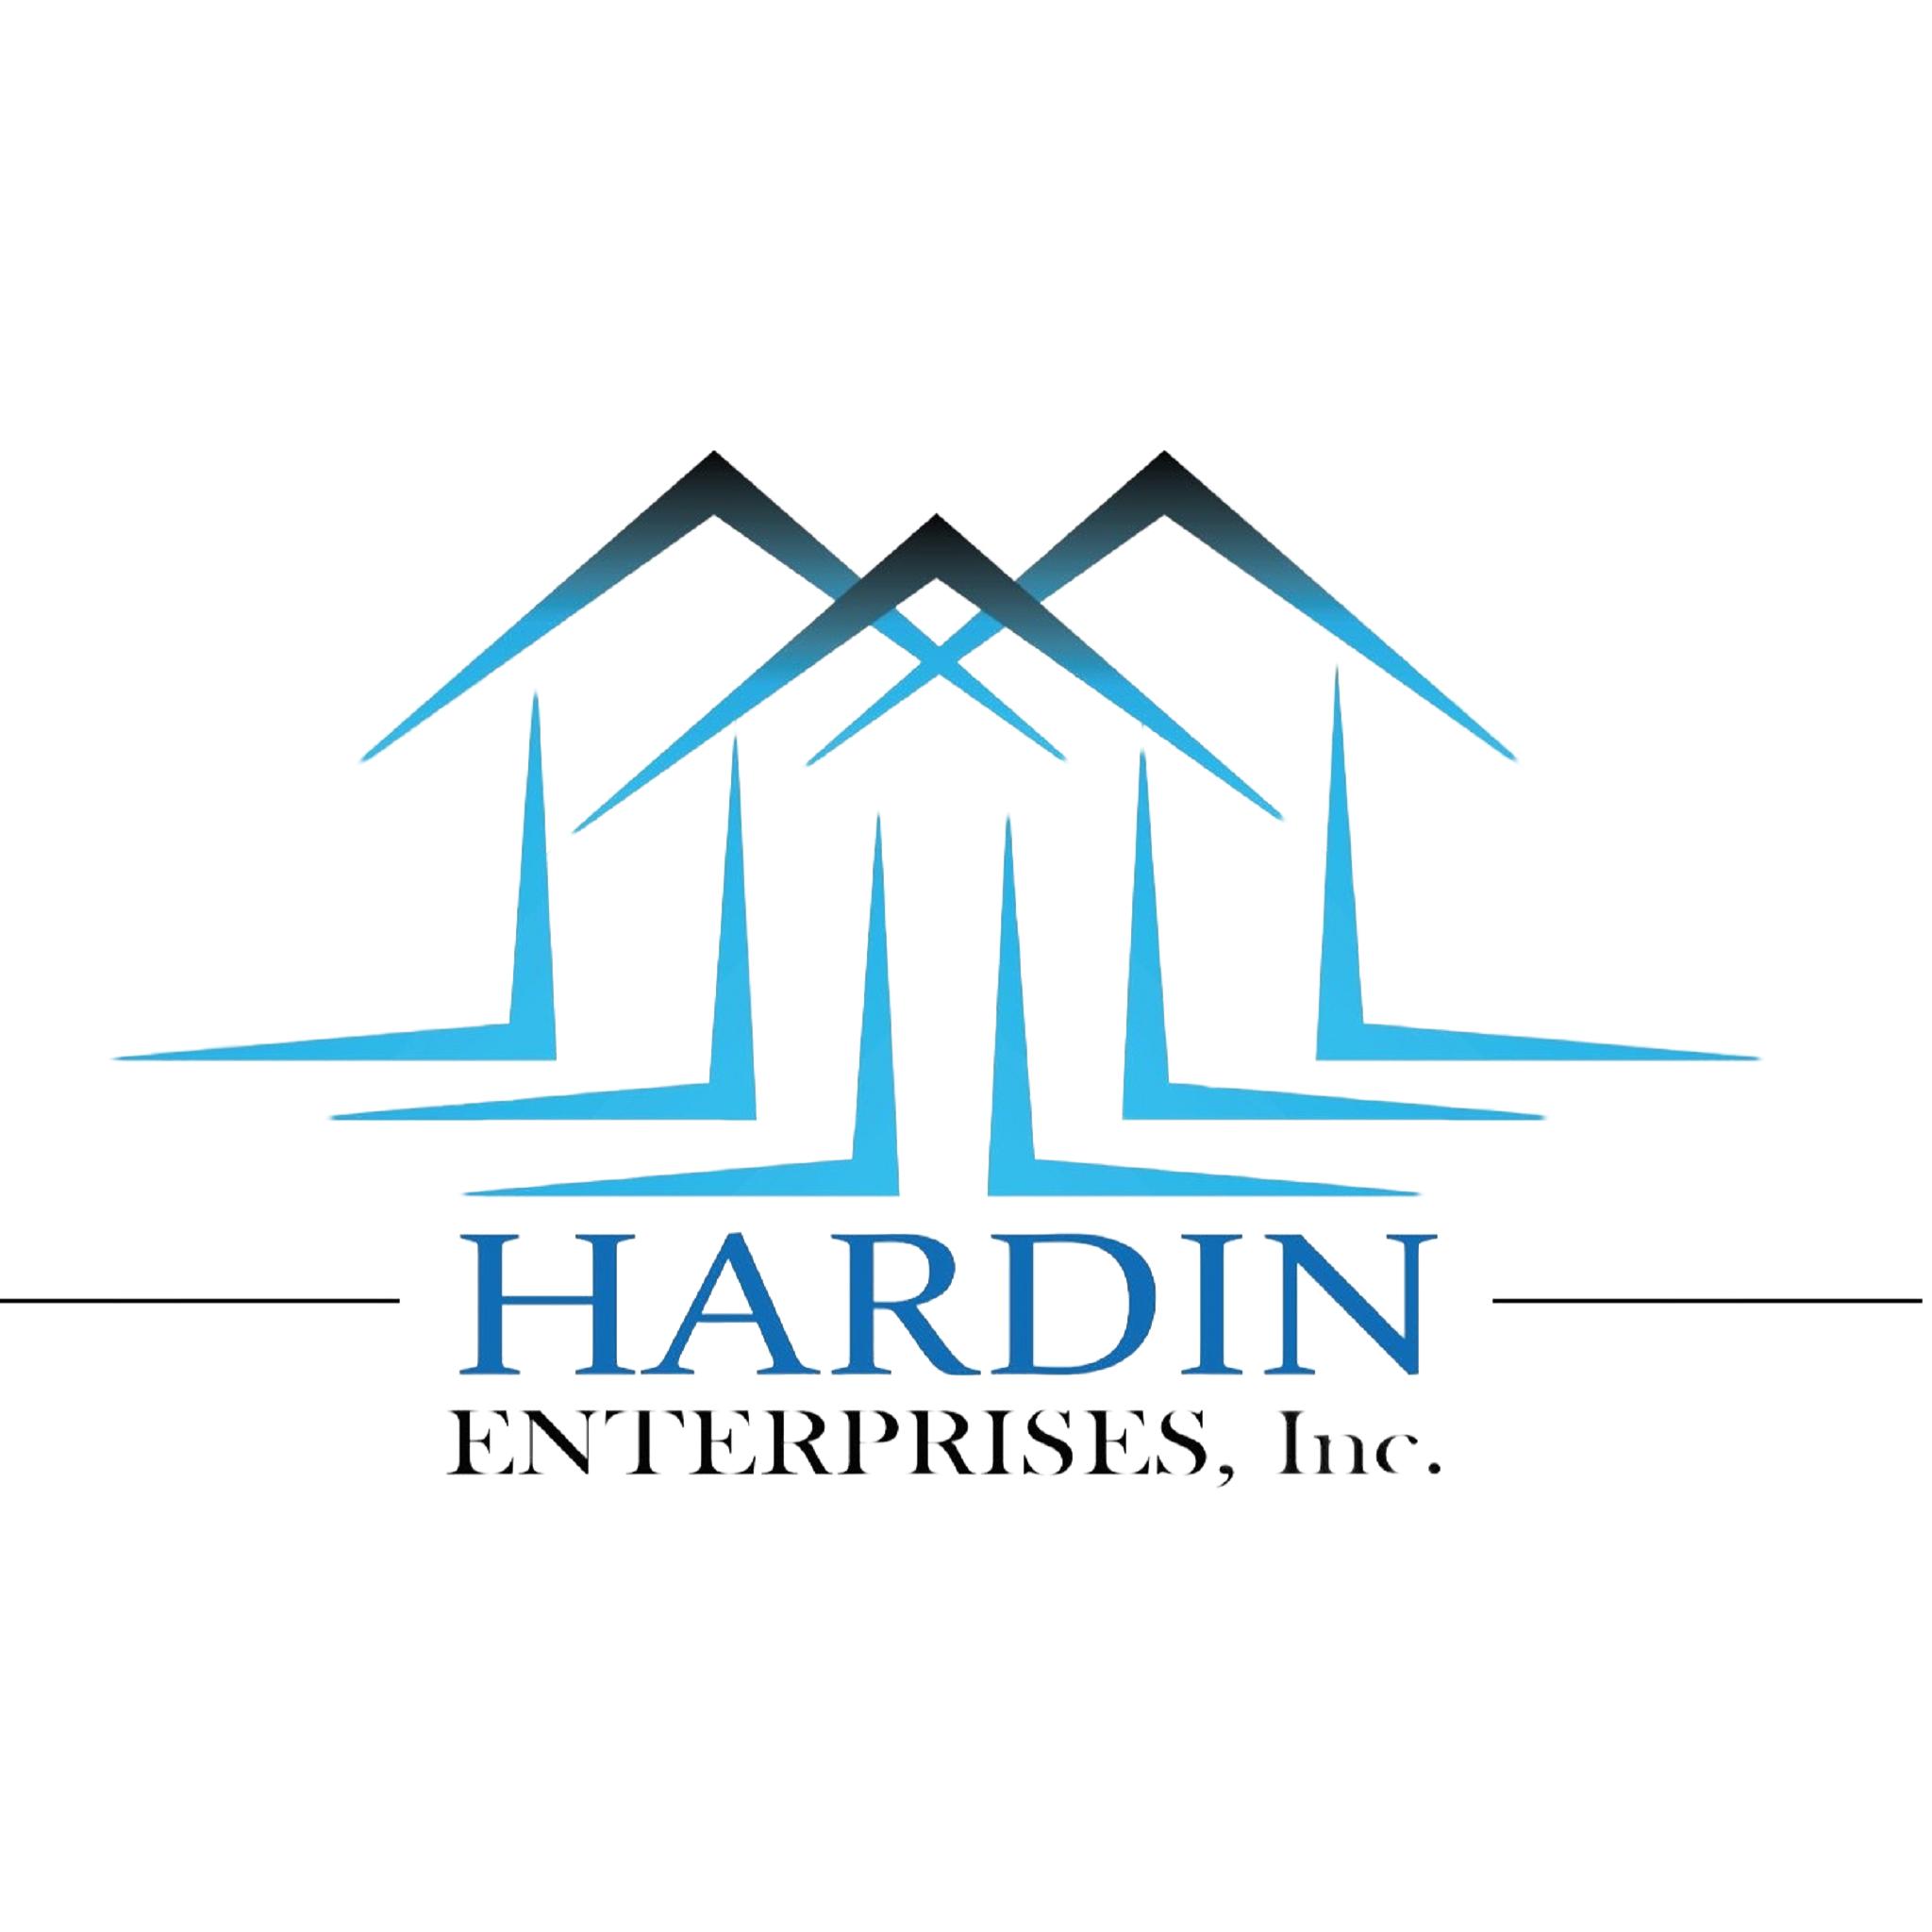 Hardin Enterprises Inc. - Arlington, TN - Real Estate Agents